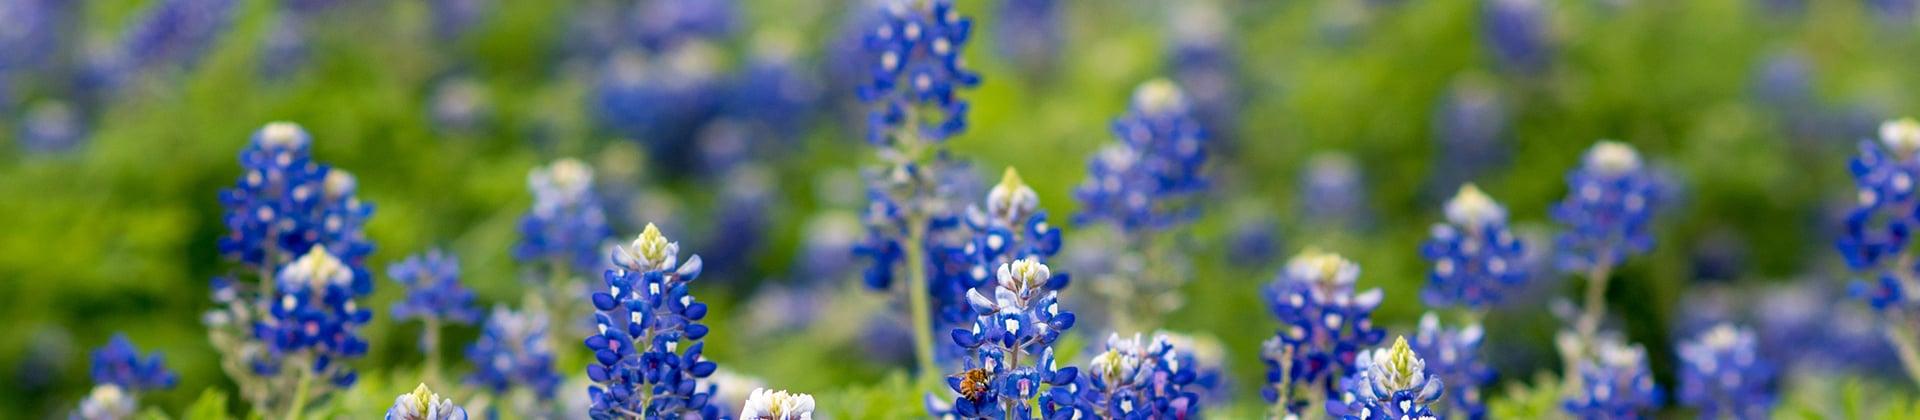 texas blue bells hero image